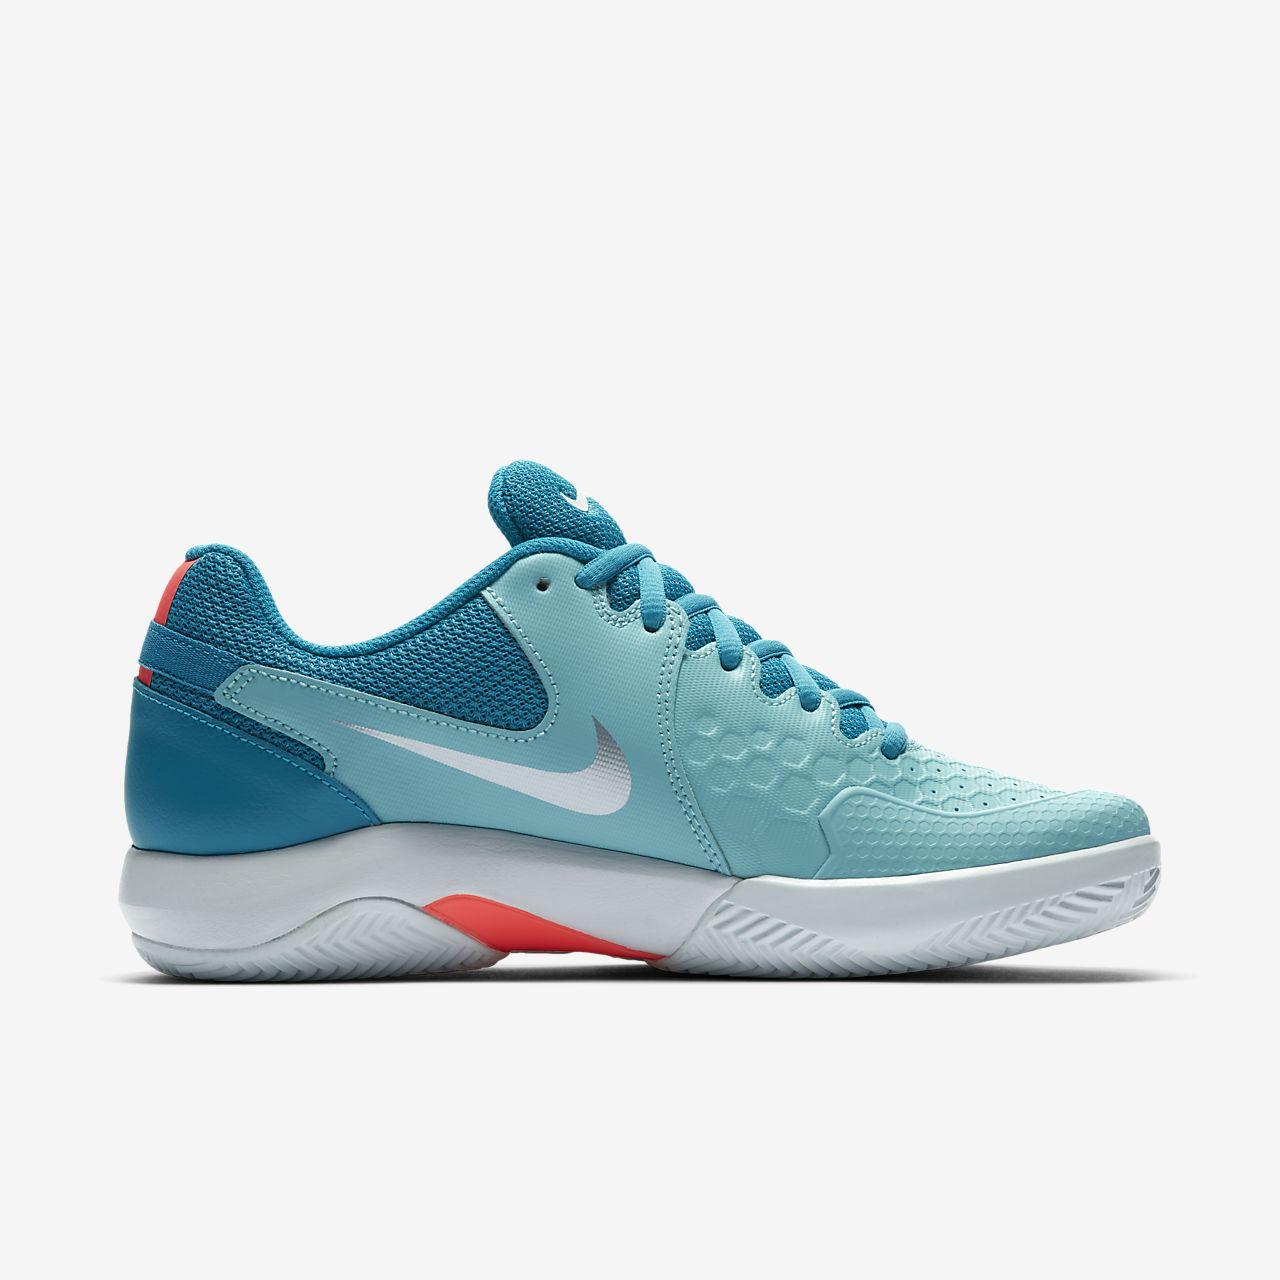 ... NikeCourt Air Zoom Resistance Clay Women's Tennis Shoe